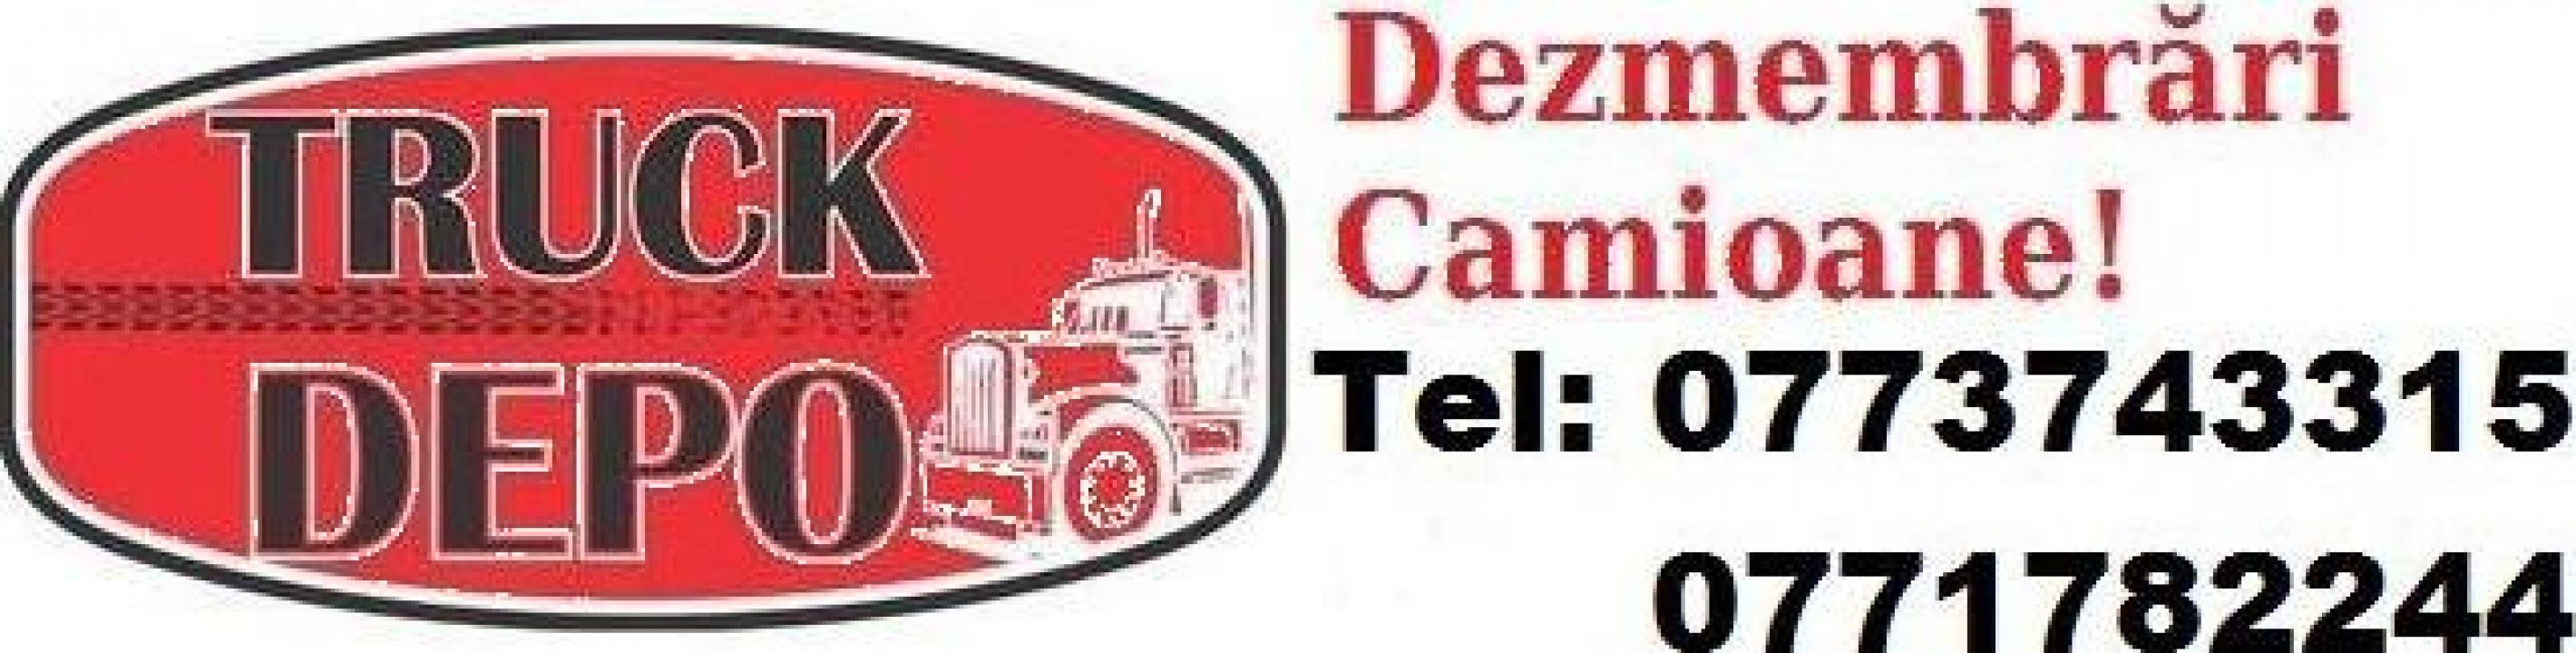 Servicii dezmembrari camioane